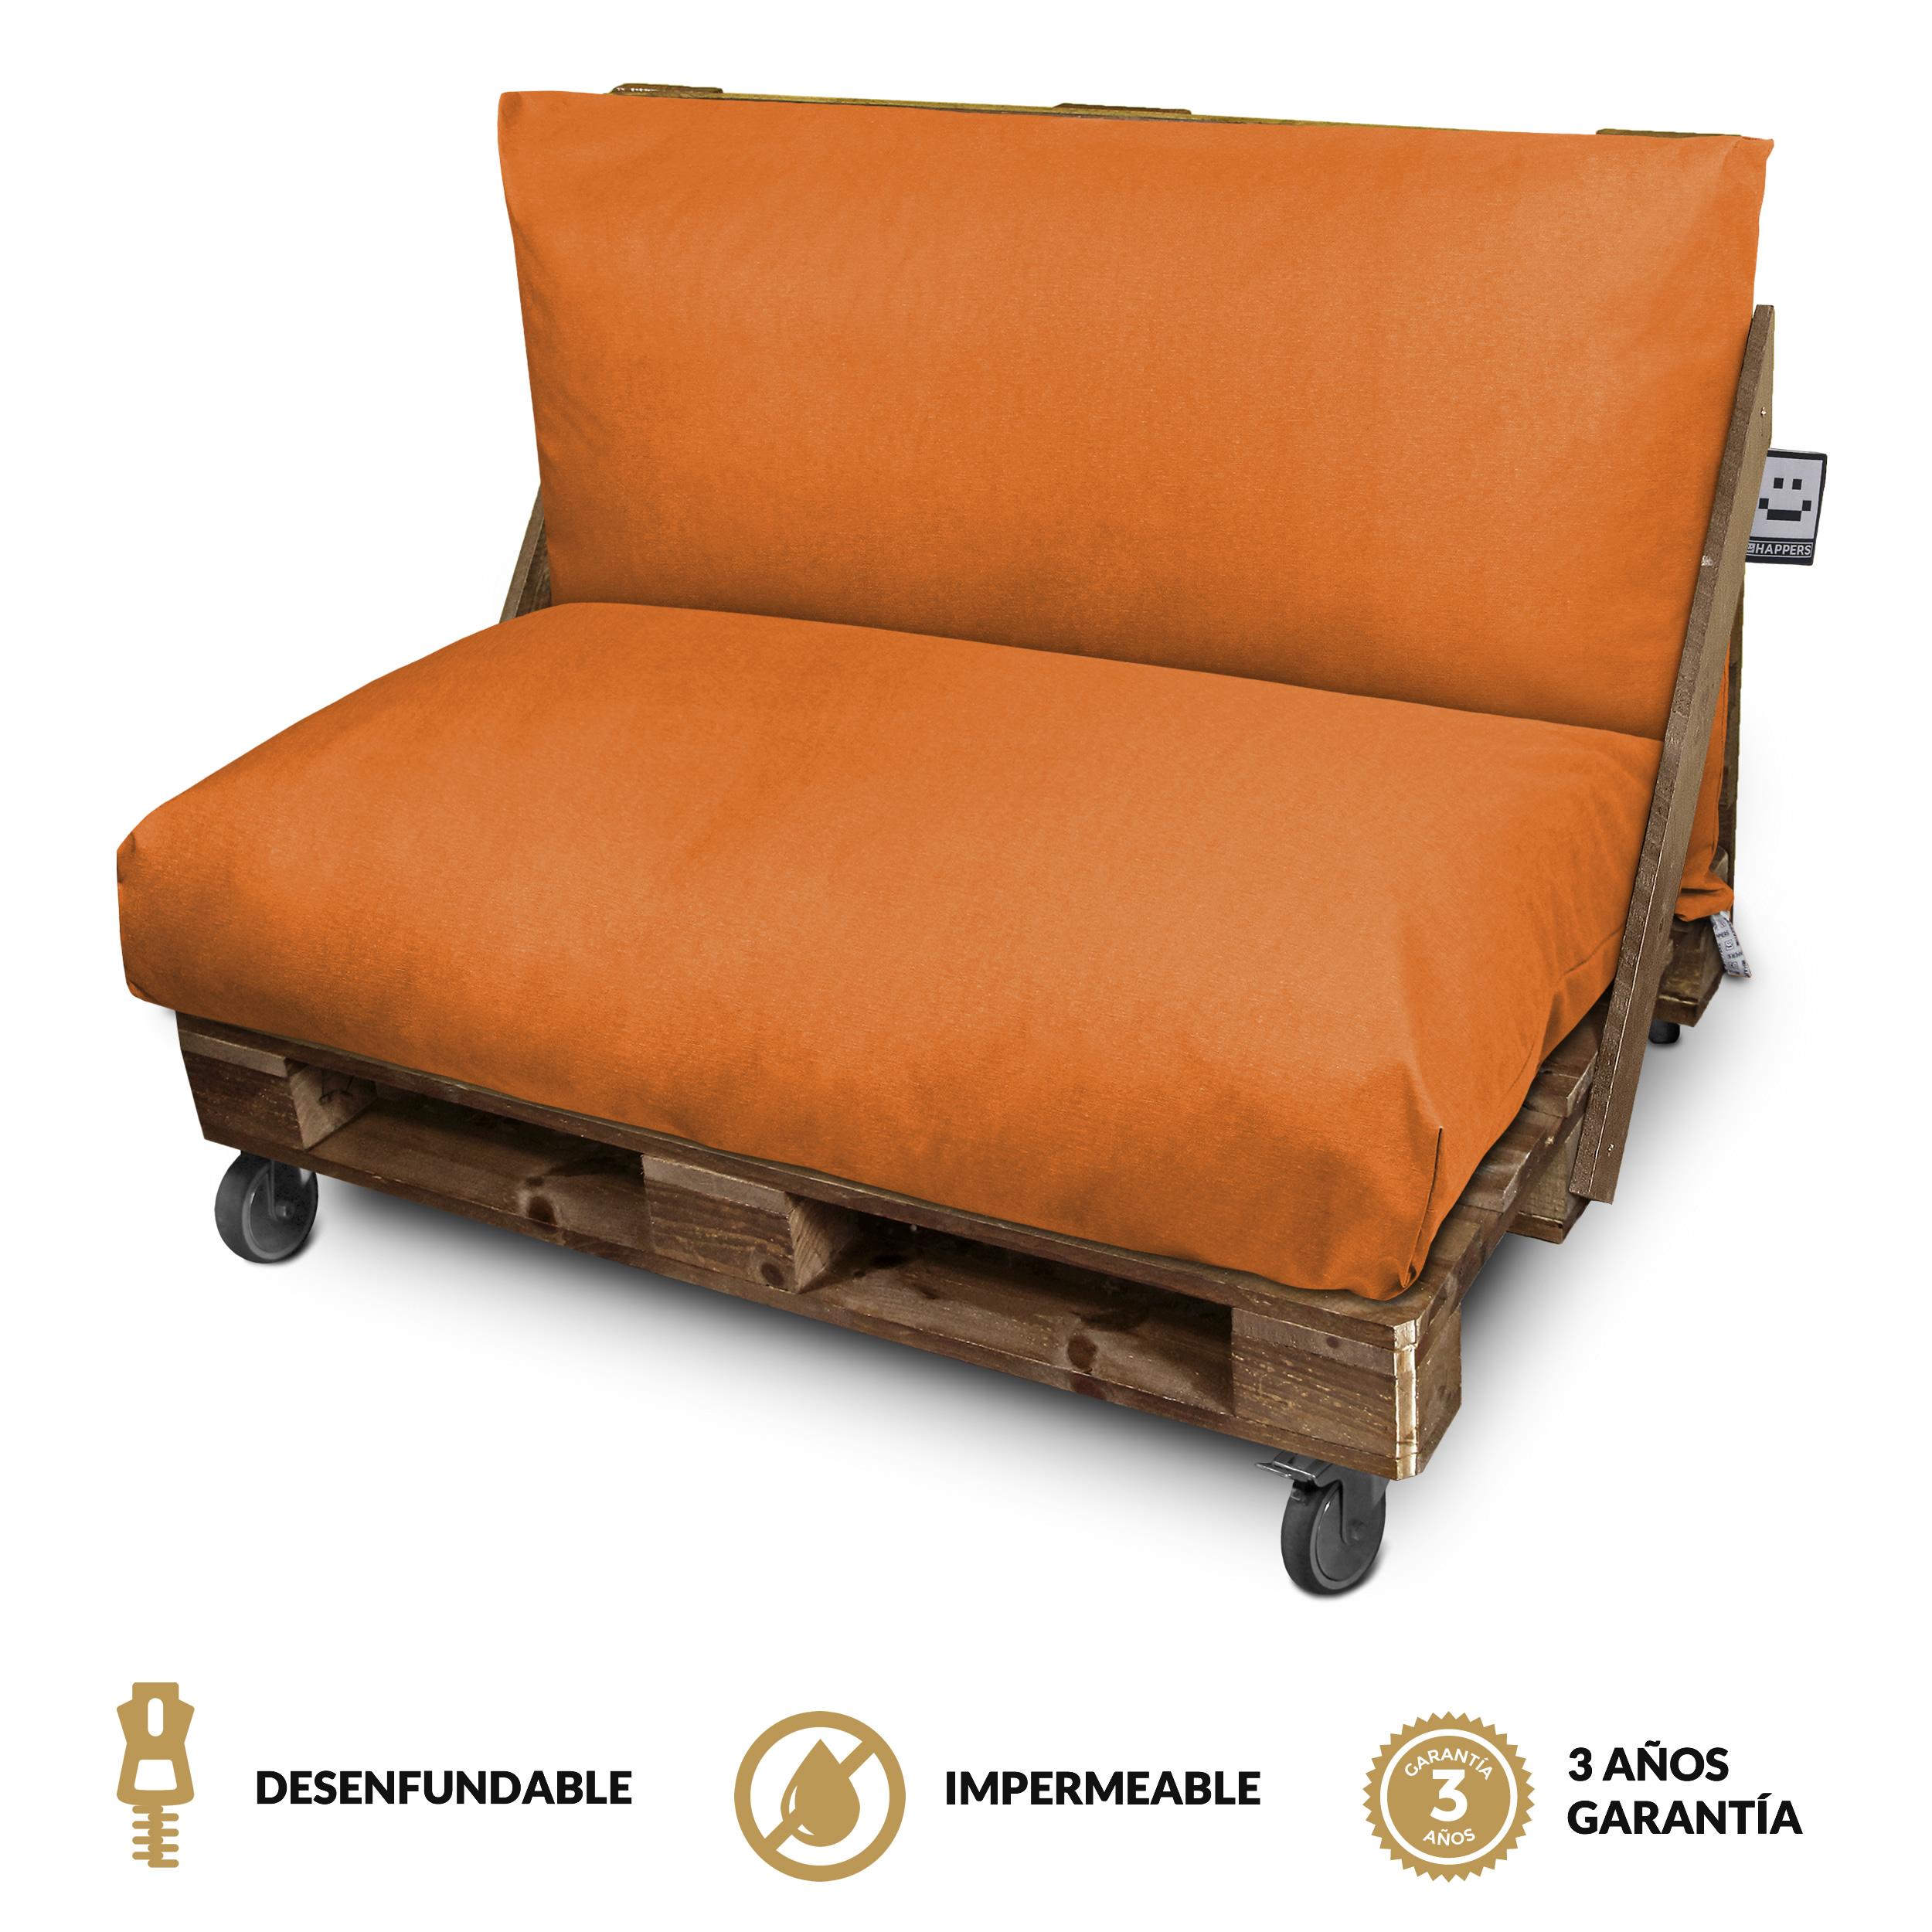 Set de Cojines Impermeables y Desenfundables en Naylim Mate para Palets de exteior Naranja